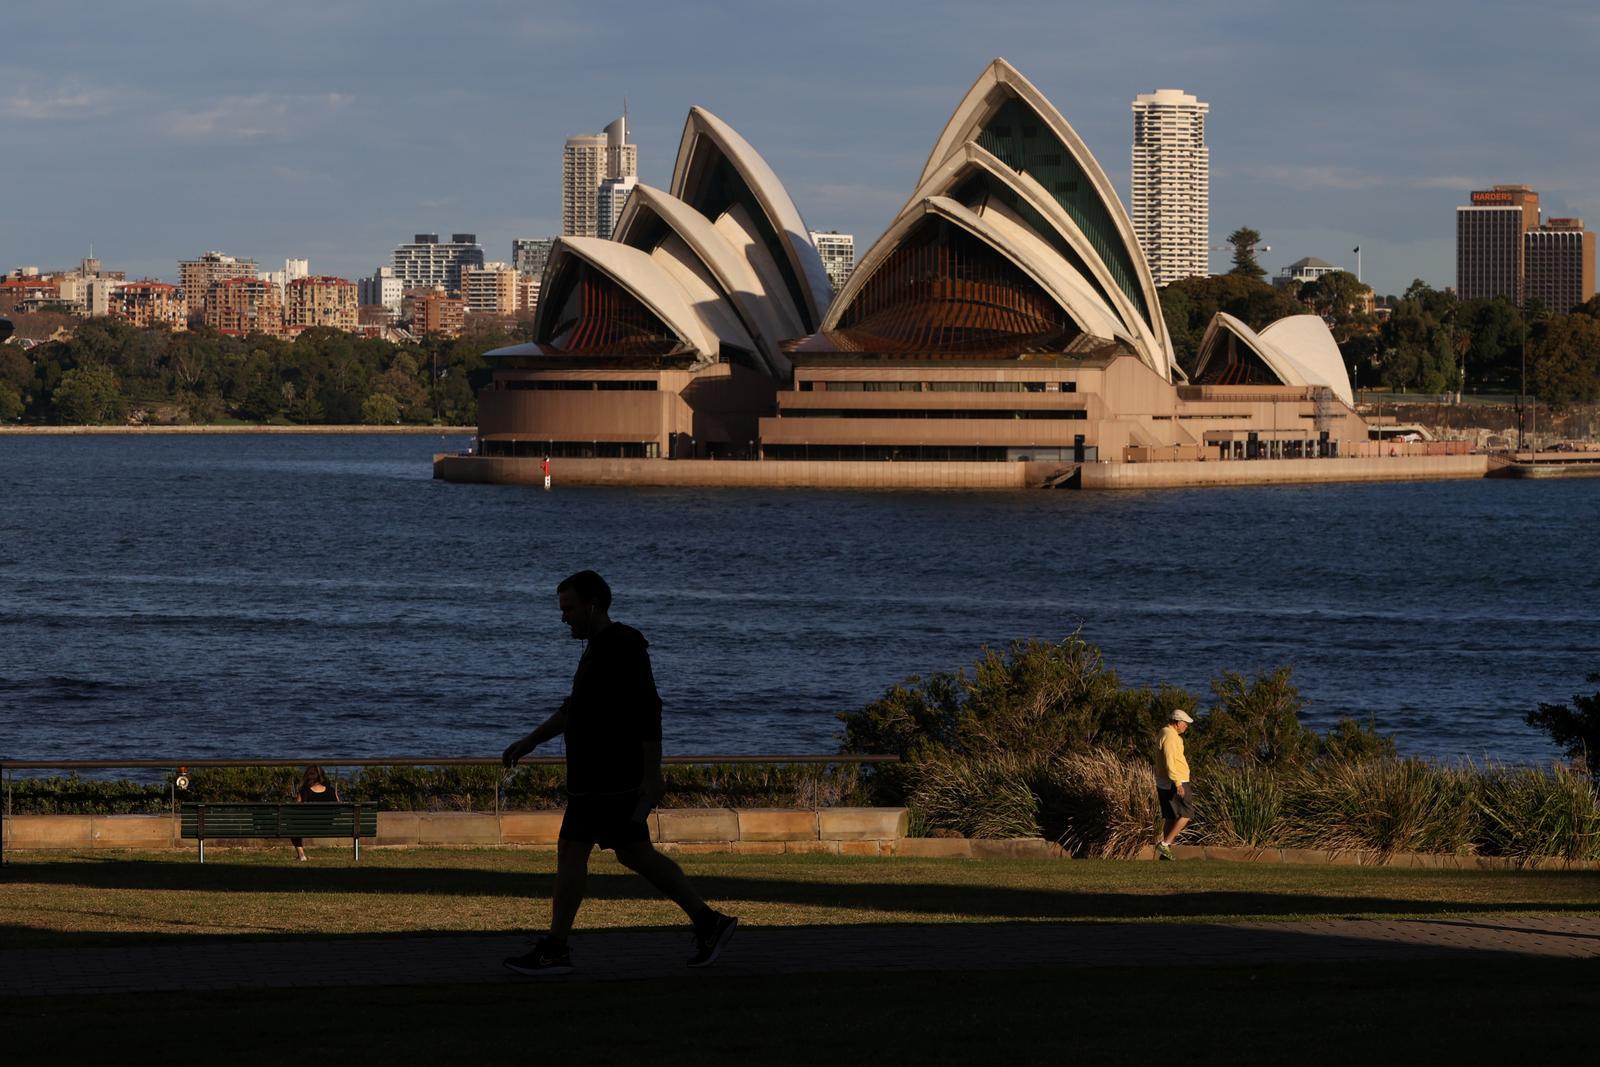 Australian police arrest over 200 after cracking underworld messaging app